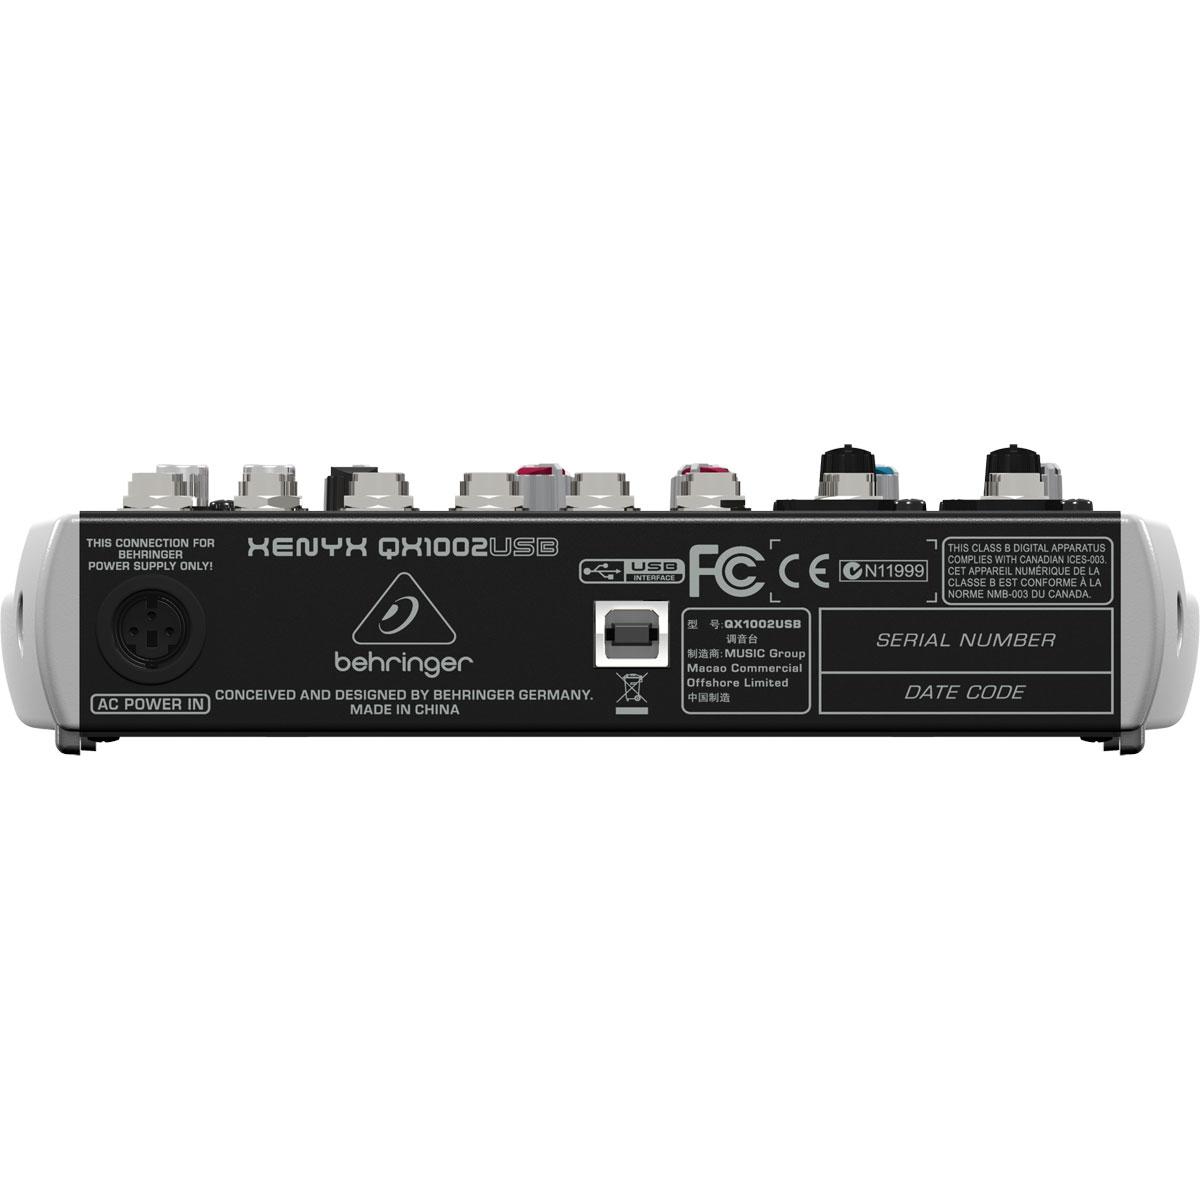 Mesa de Som 10 Canais Balanceados (2 XLR + 8 P10) c/ USB / Efeito / Phantom / 1 Auxiliar Xenyx QX 1002 USB - Behringer